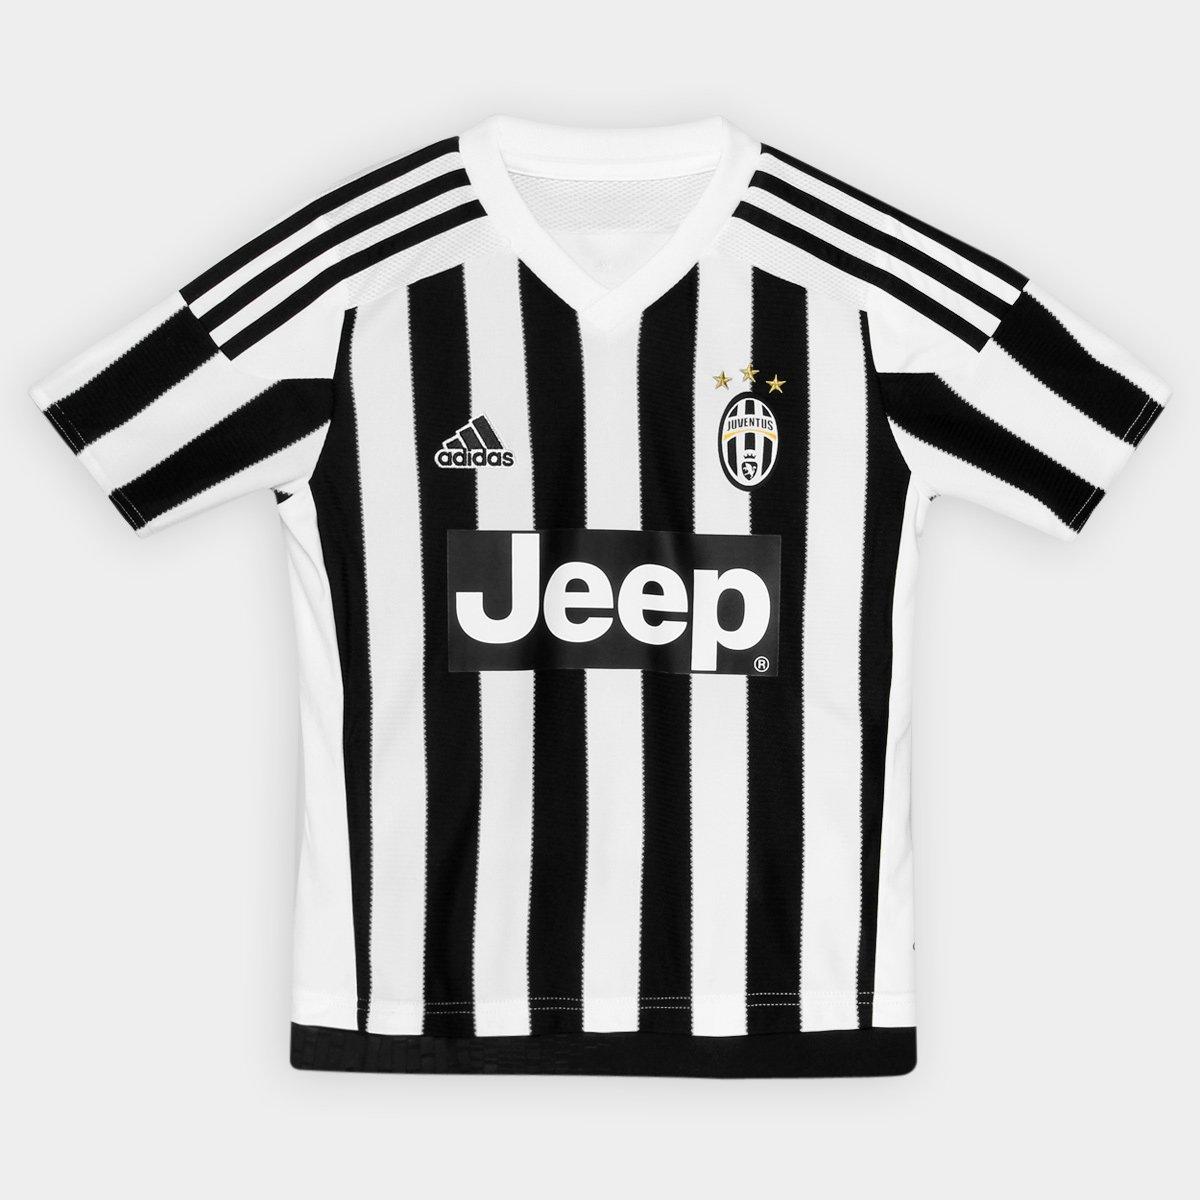 Camisa Adidas Juventus Home 15 16 s nº Infantil - Compre Agora ... 3d28cfe7ec148